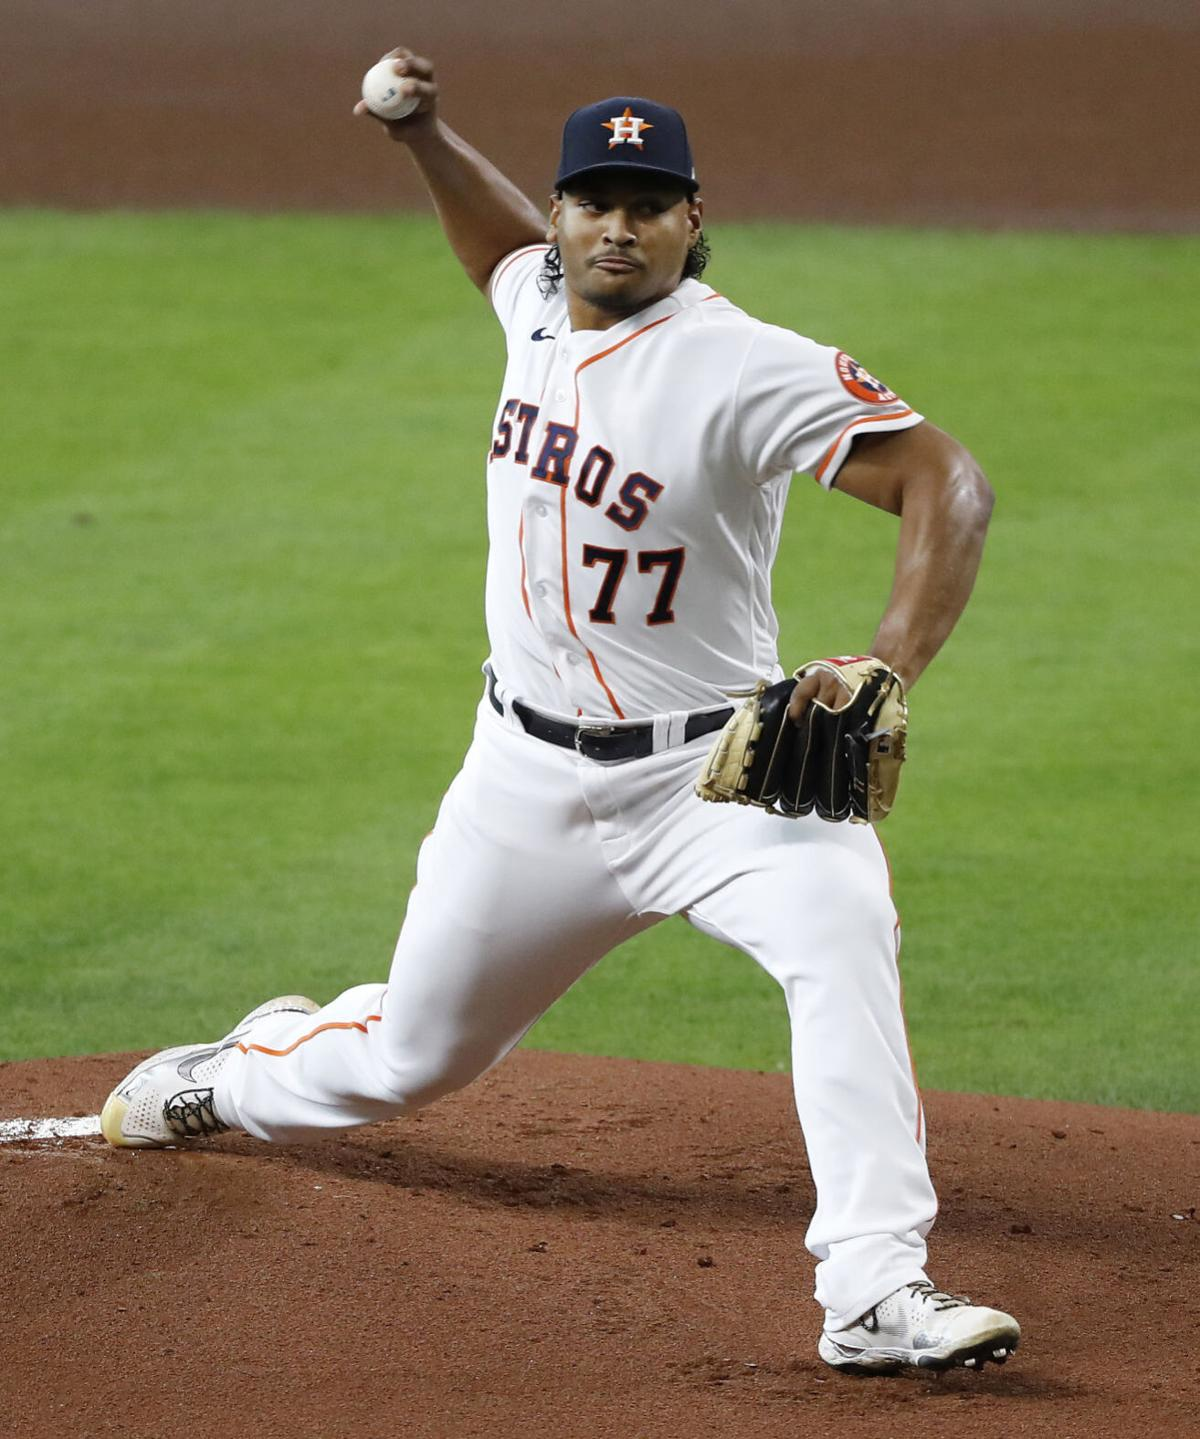 Houston Astros vs. Seattle Mariners